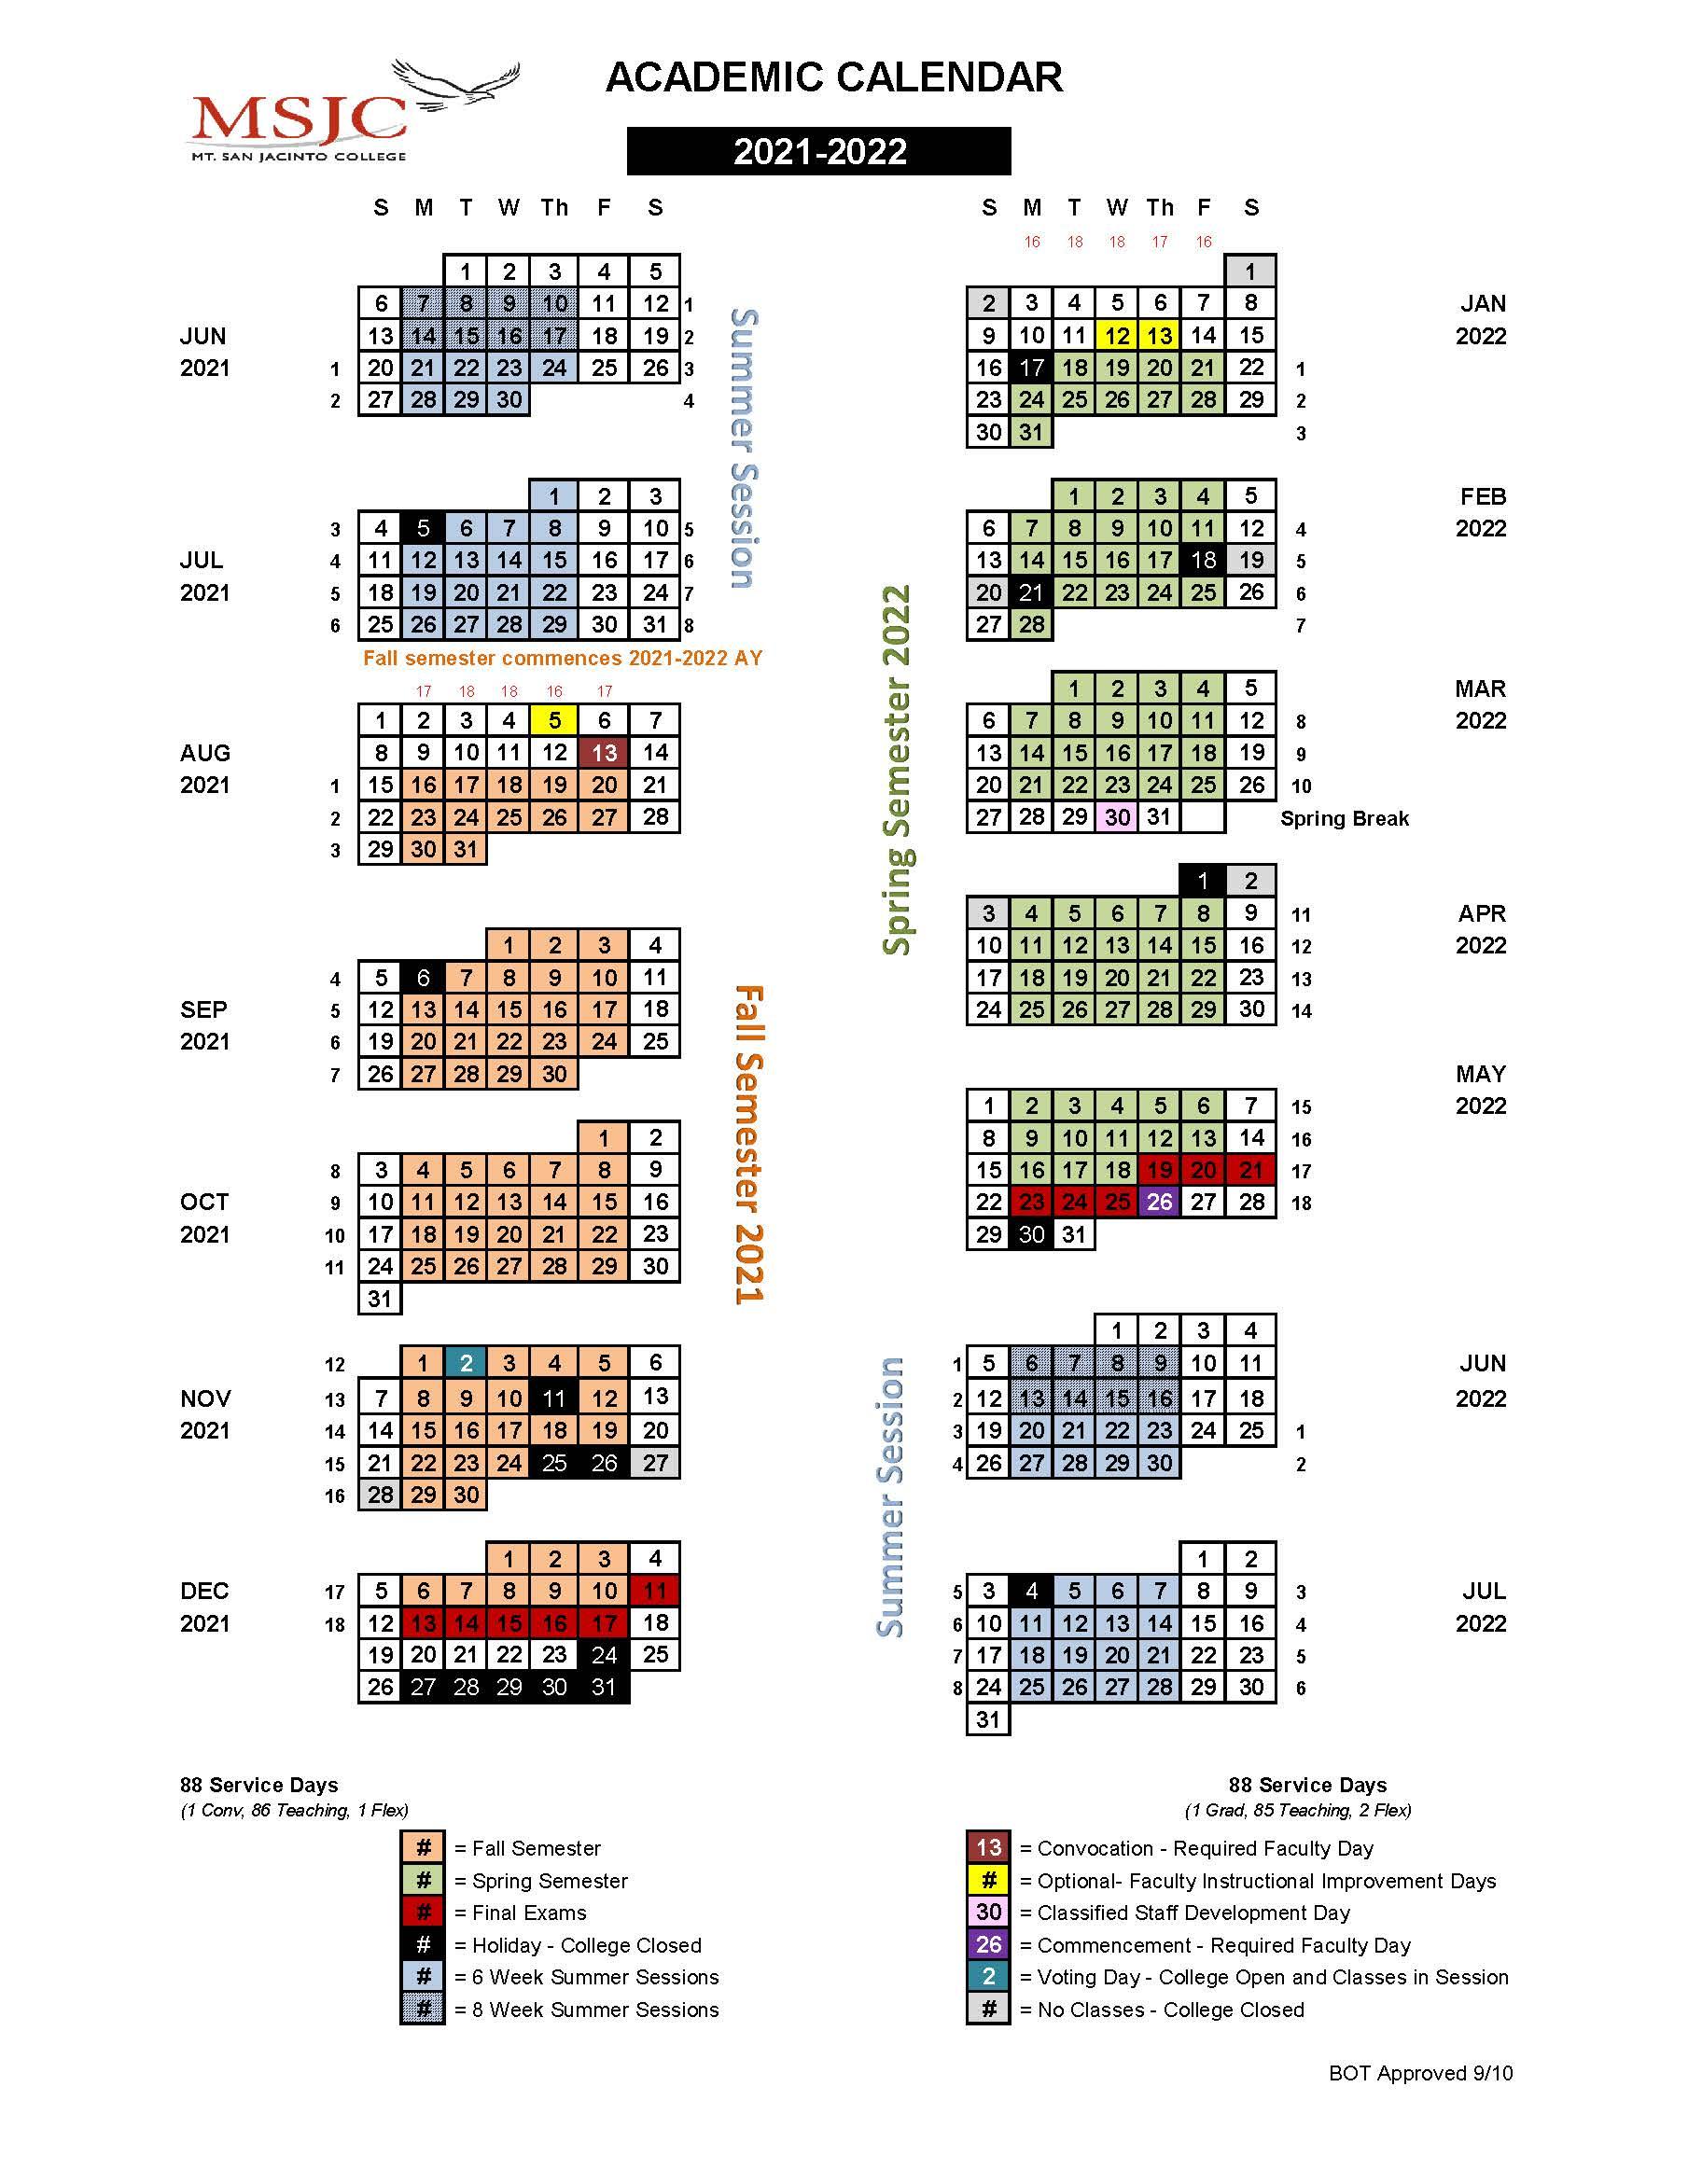 MSJC Events   2021 2022 Academic Calendar is now available